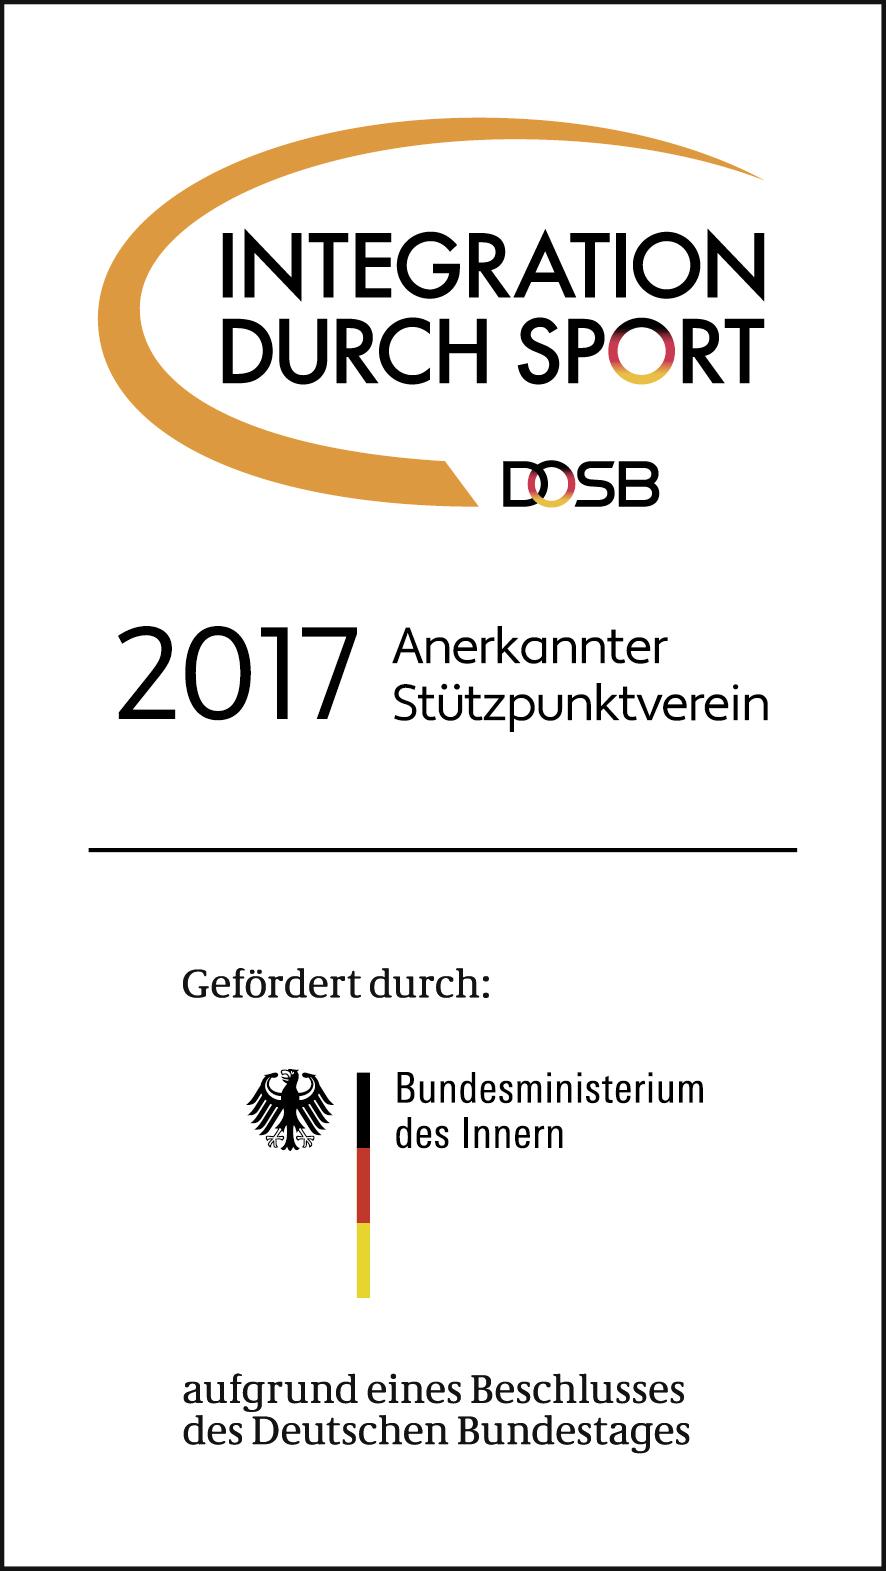 IntegrationDurchSport